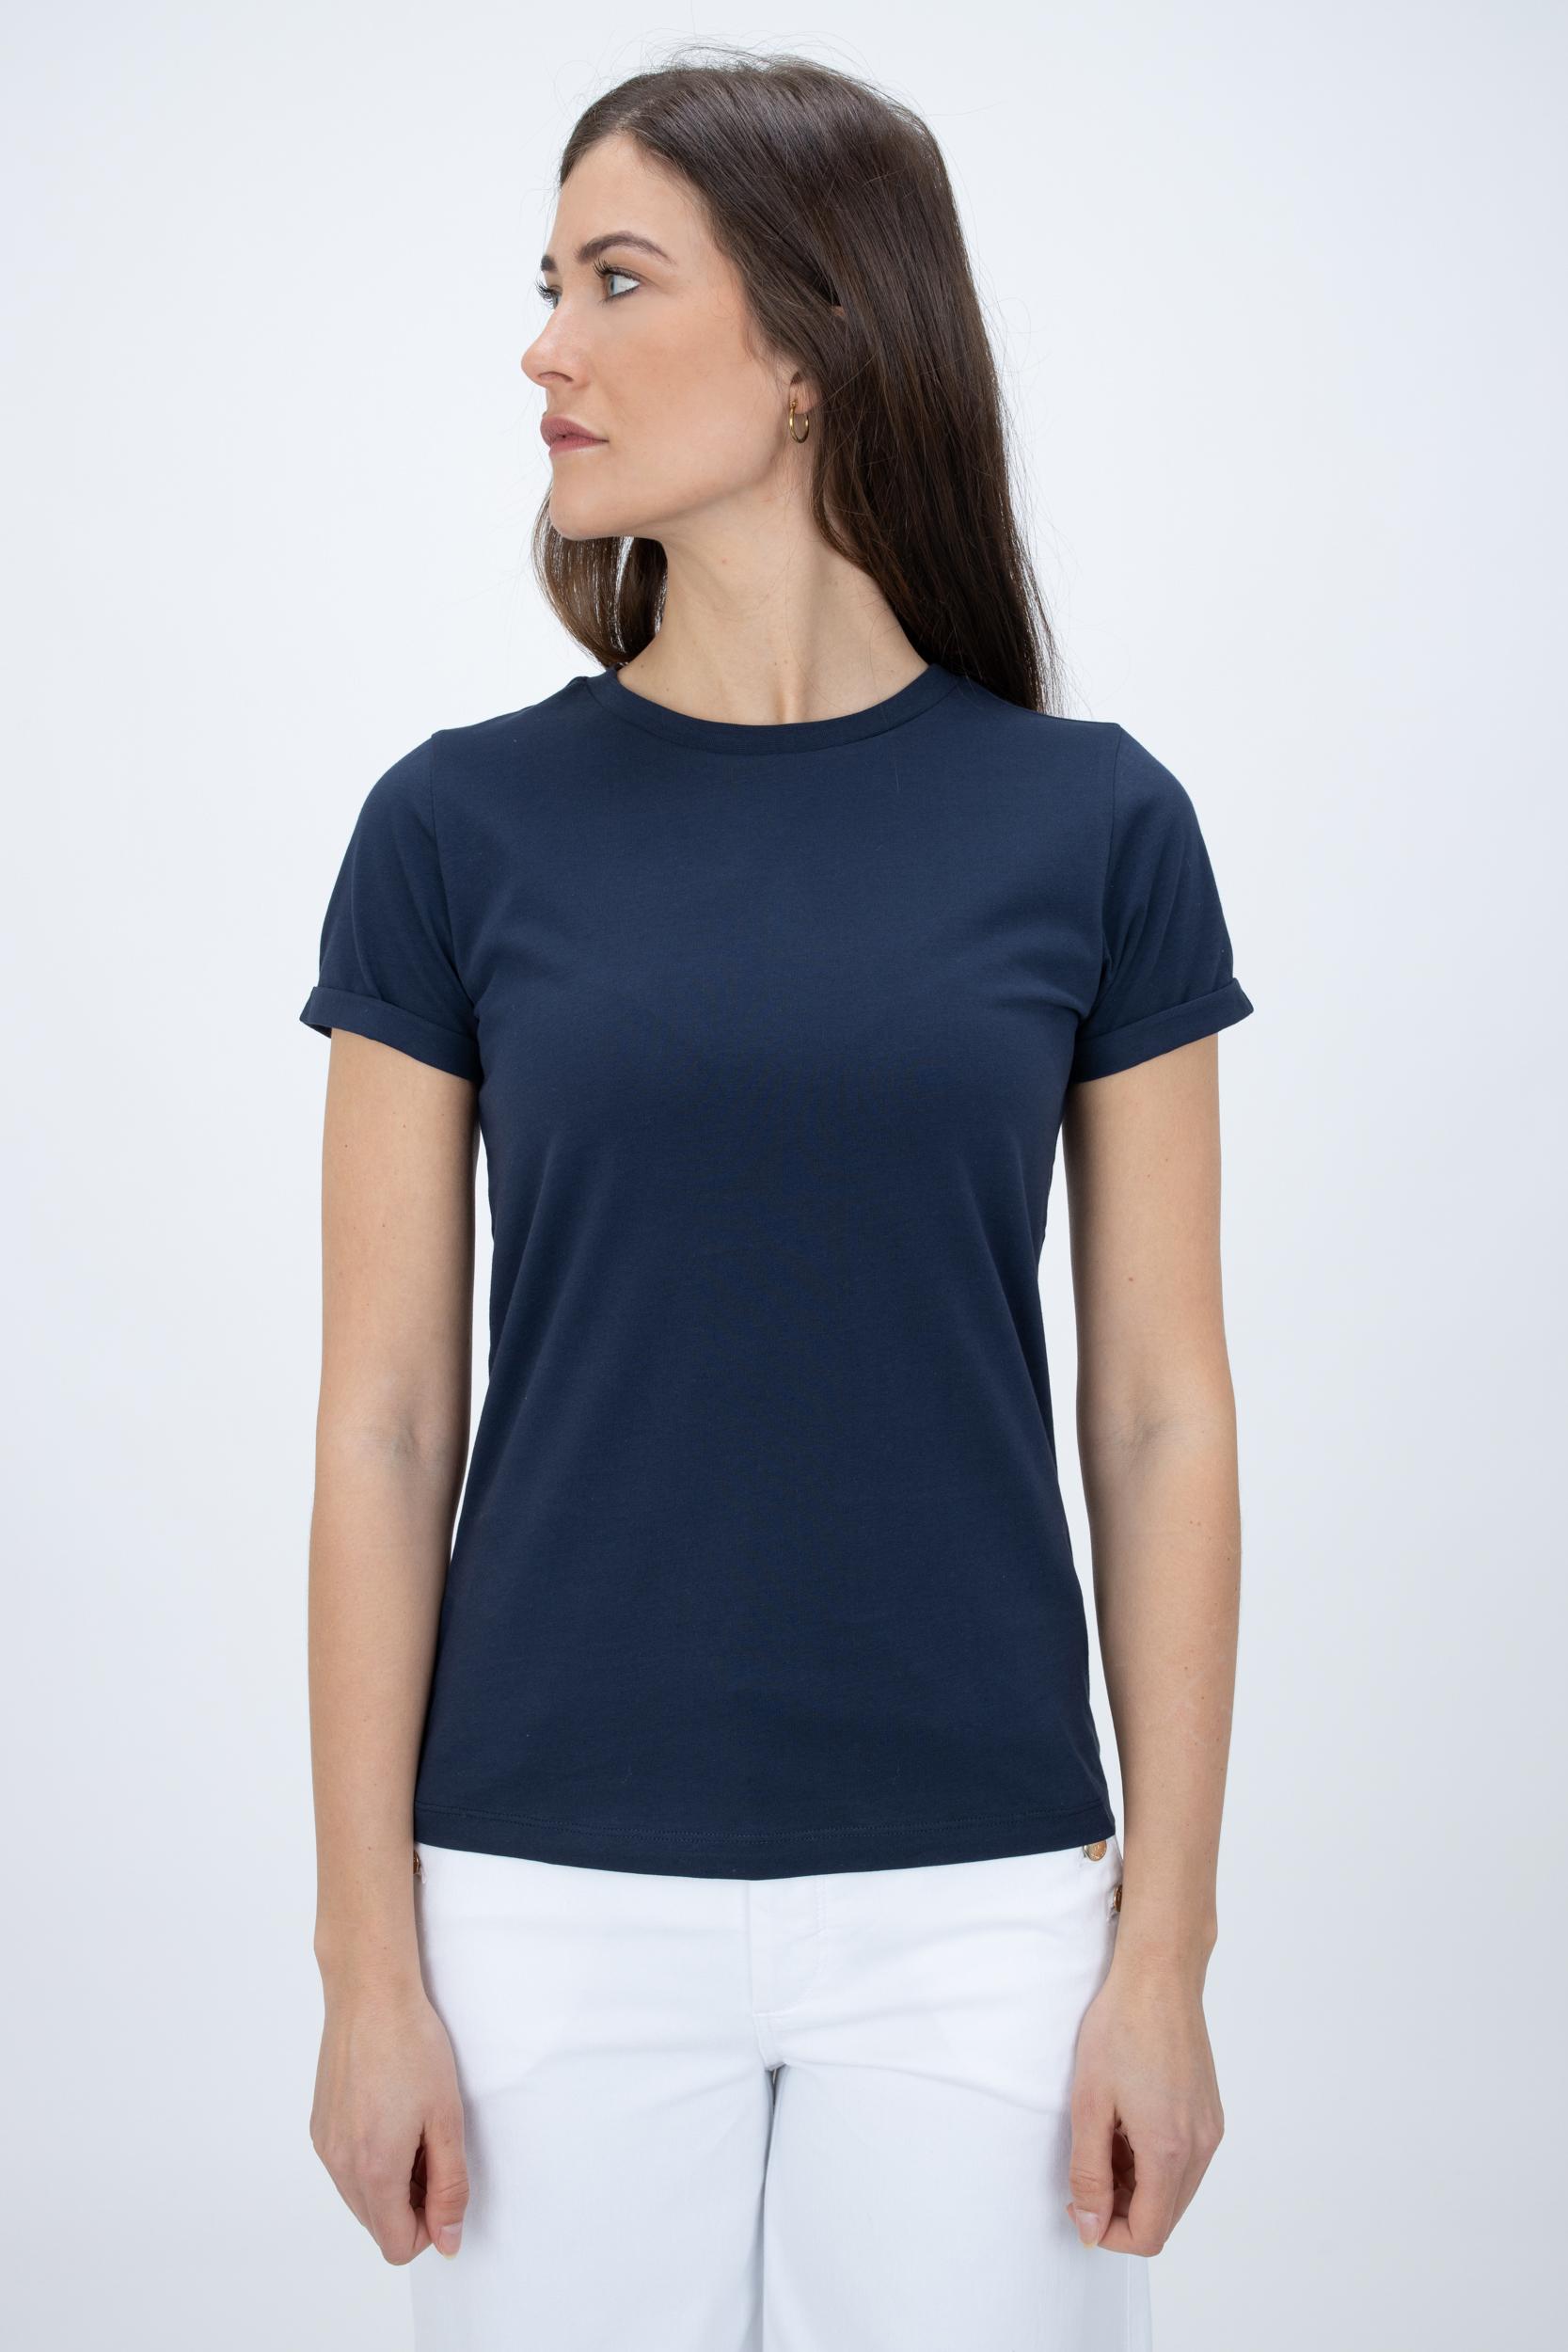 T-Shirt The Plain Tee 1